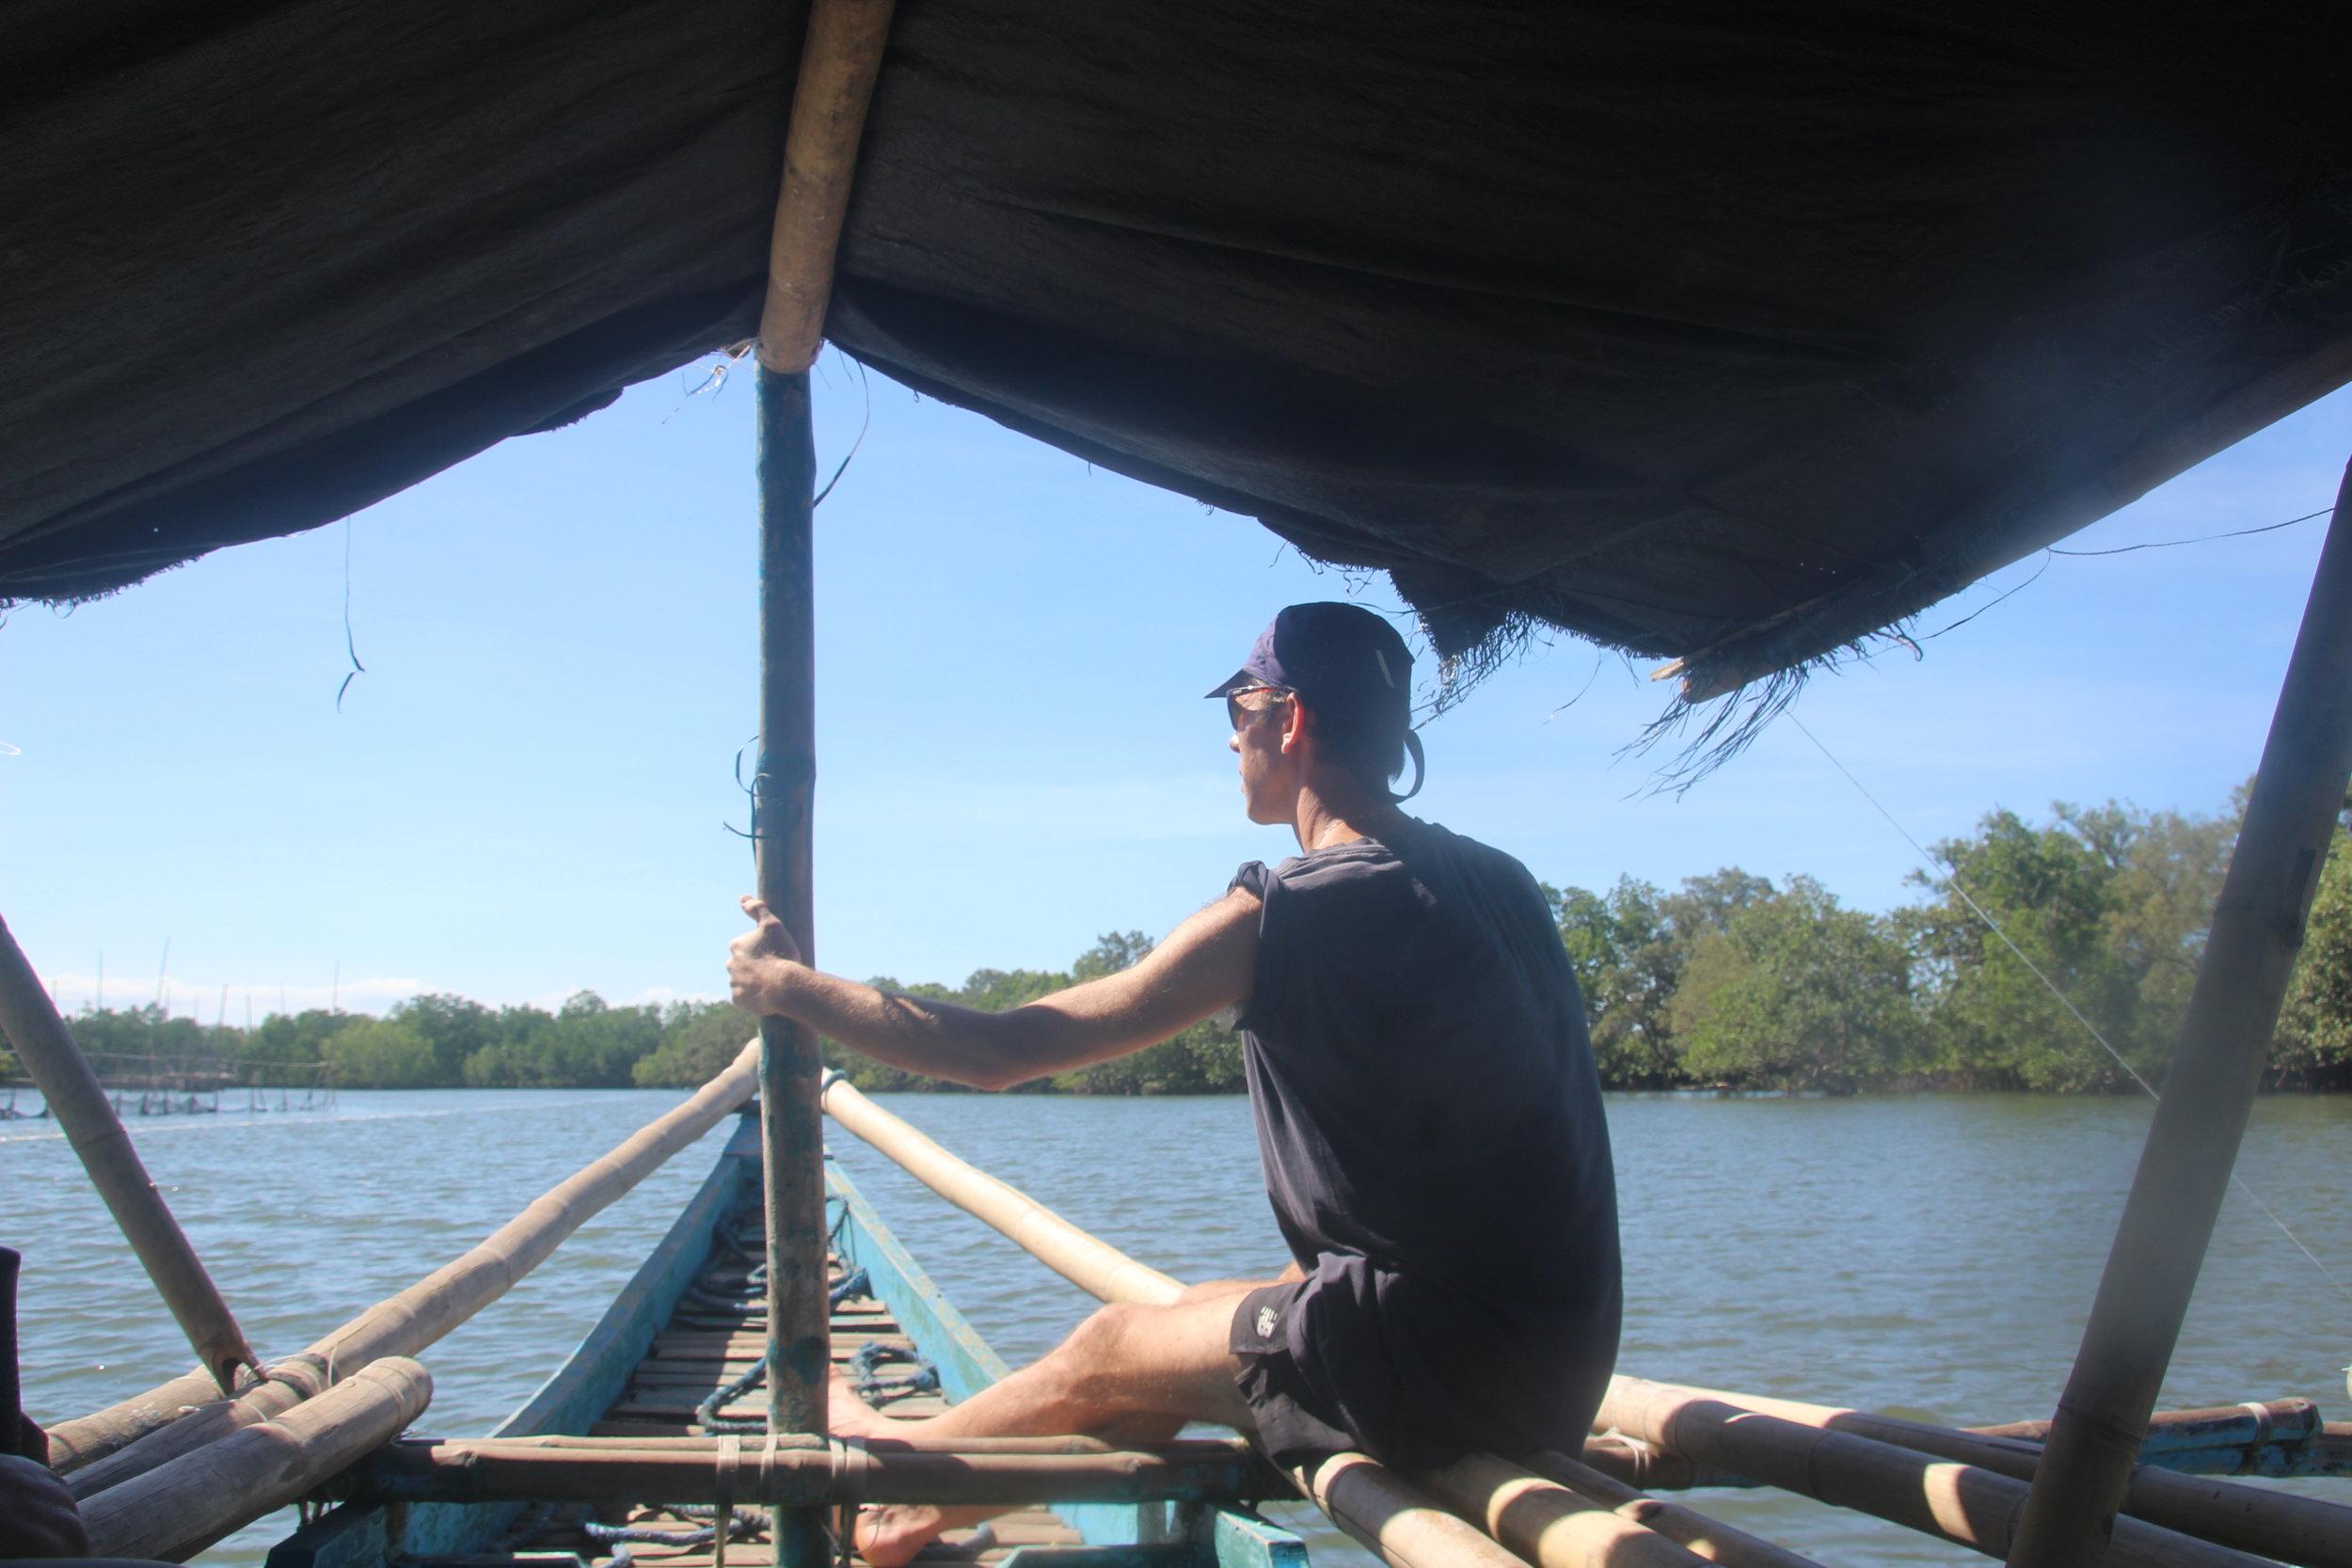 TinagongDagatIMG_8619.JPG